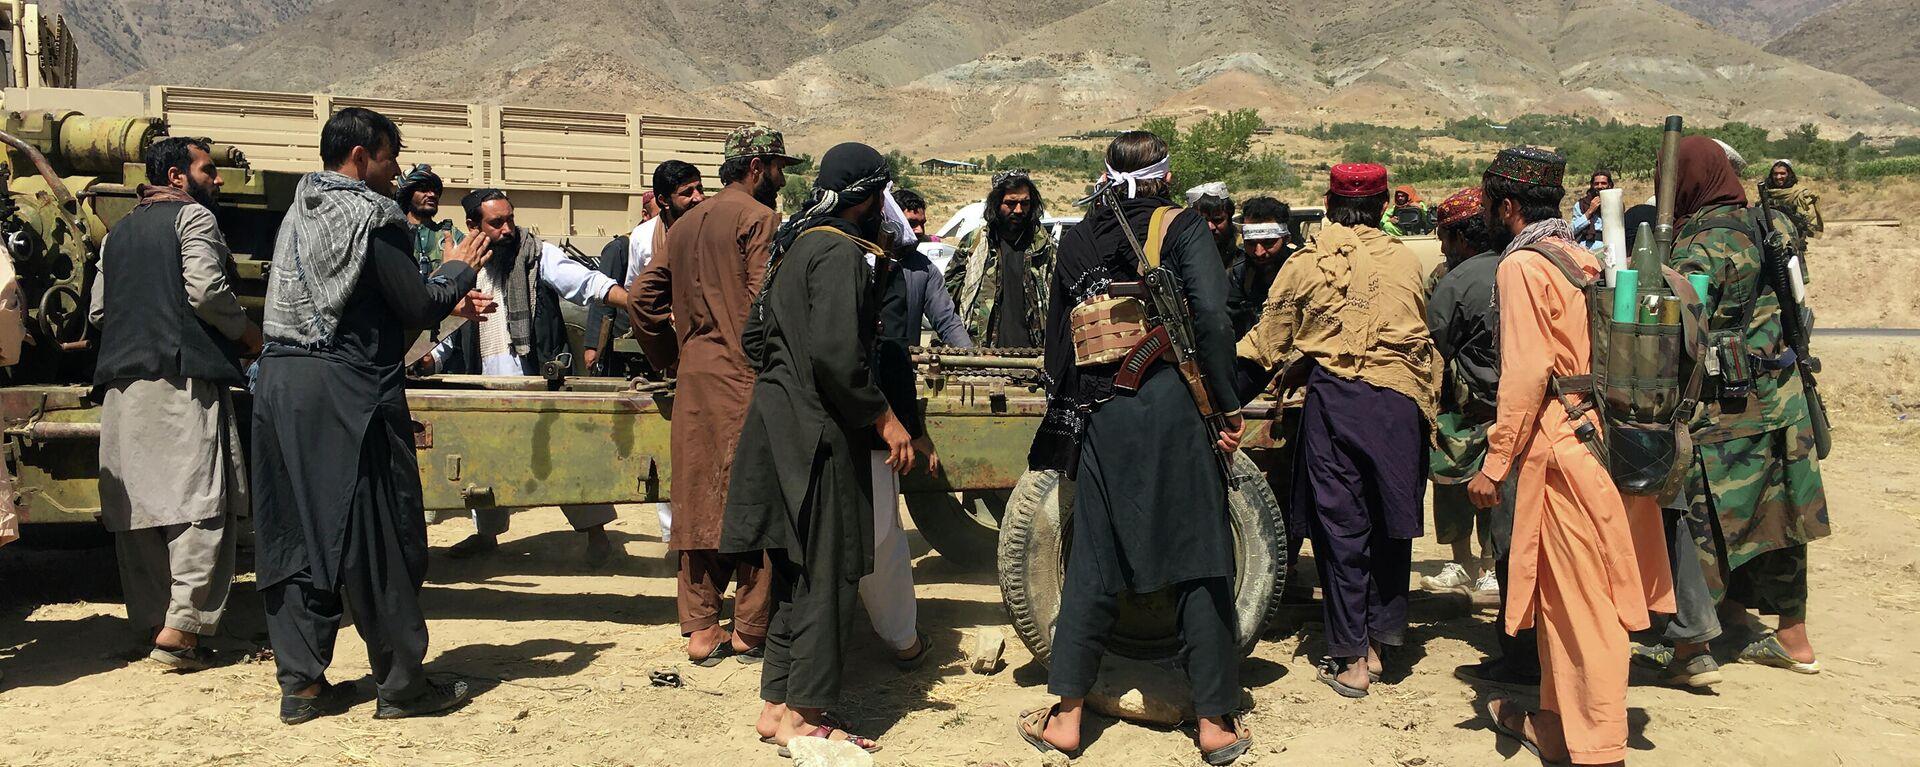 Taliban-Kämpfer in der Provinz Panjshir - SNA, 1920, 10.09.2021